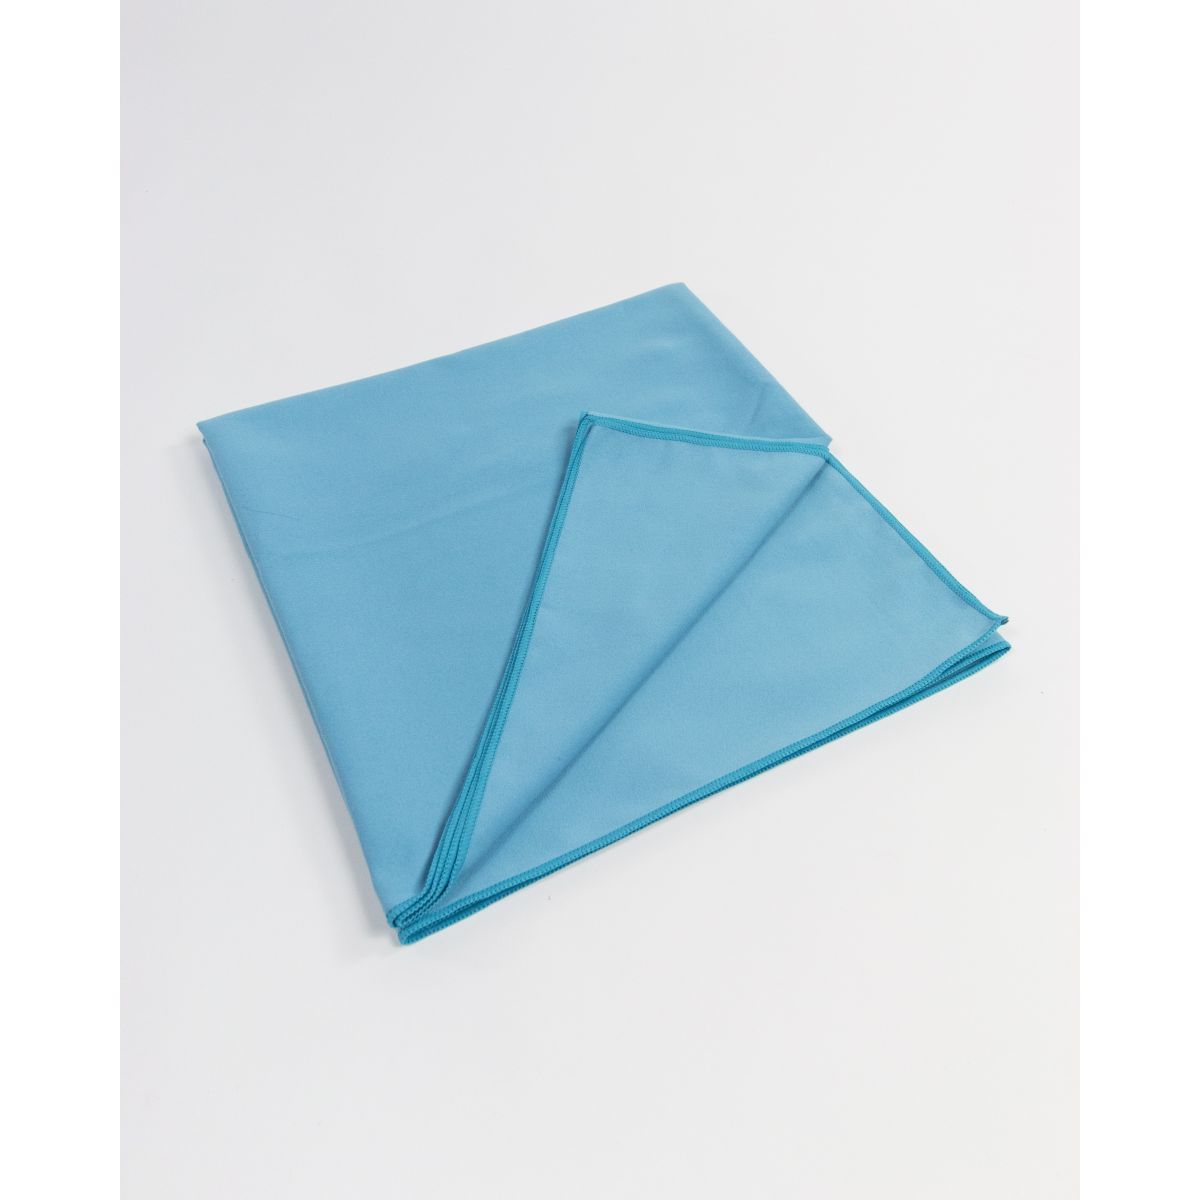 drap de douche en microfibre heiata coloris bleu naiade bodynamic. Black Bedroom Furniture Sets. Home Design Ideas